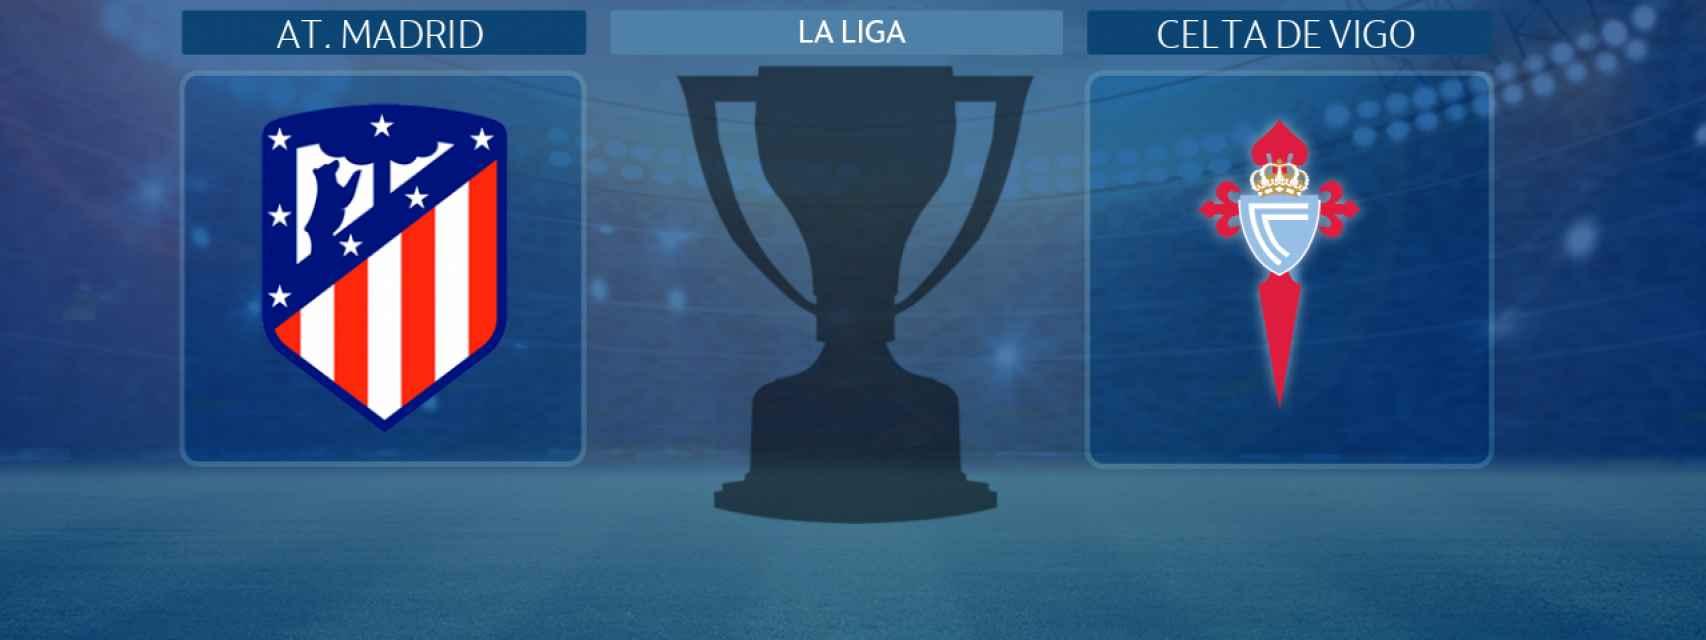 Atlético de Madrid - Celta de Vigo, partido de La Liga